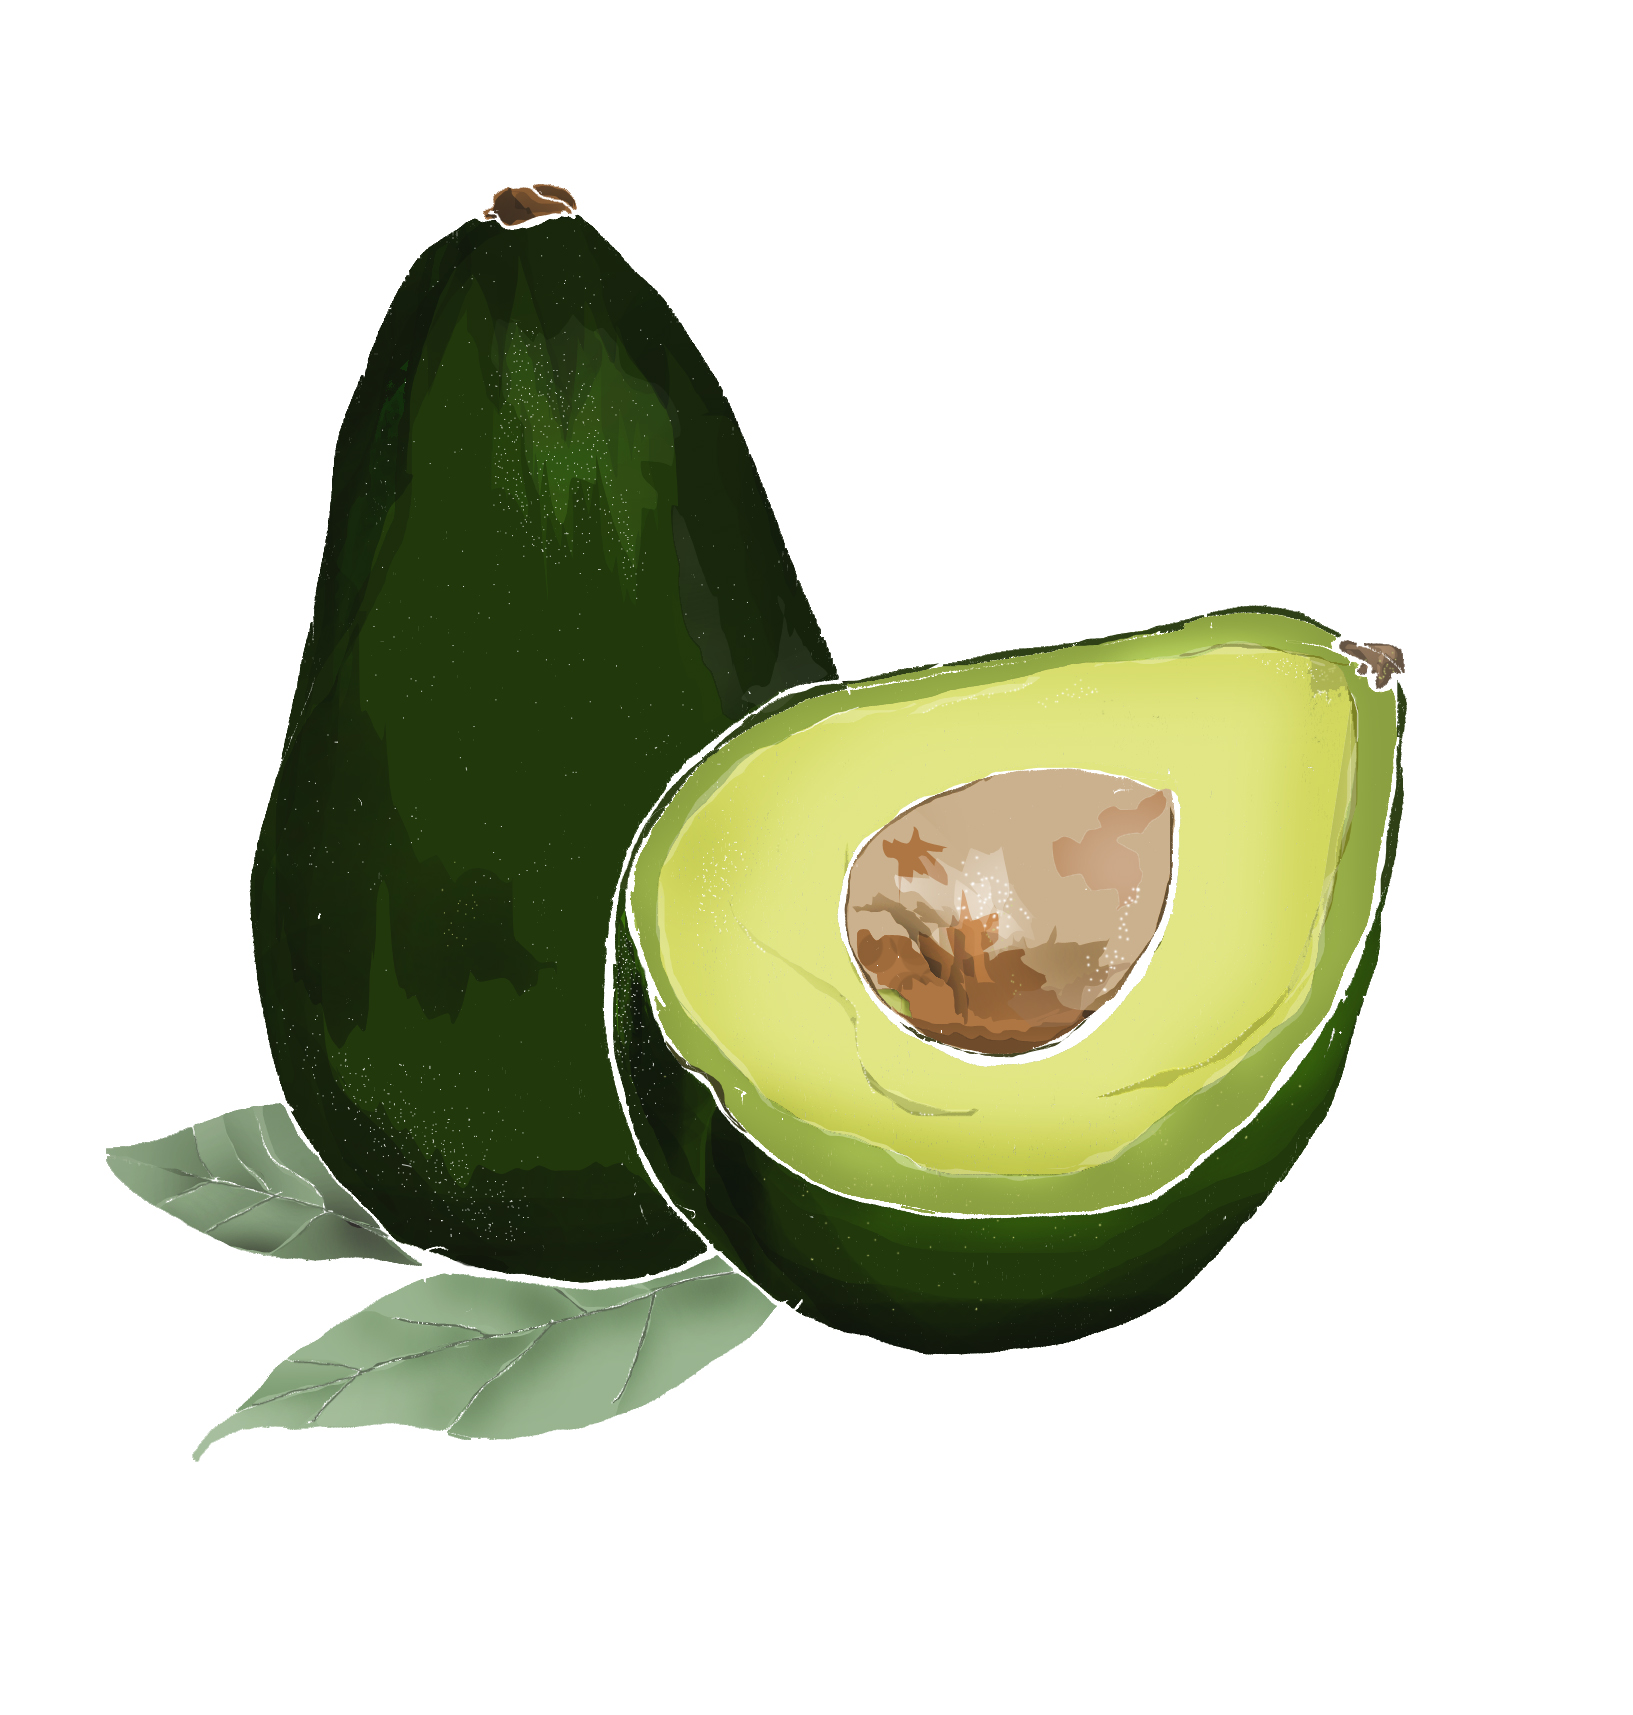 A - Avocado